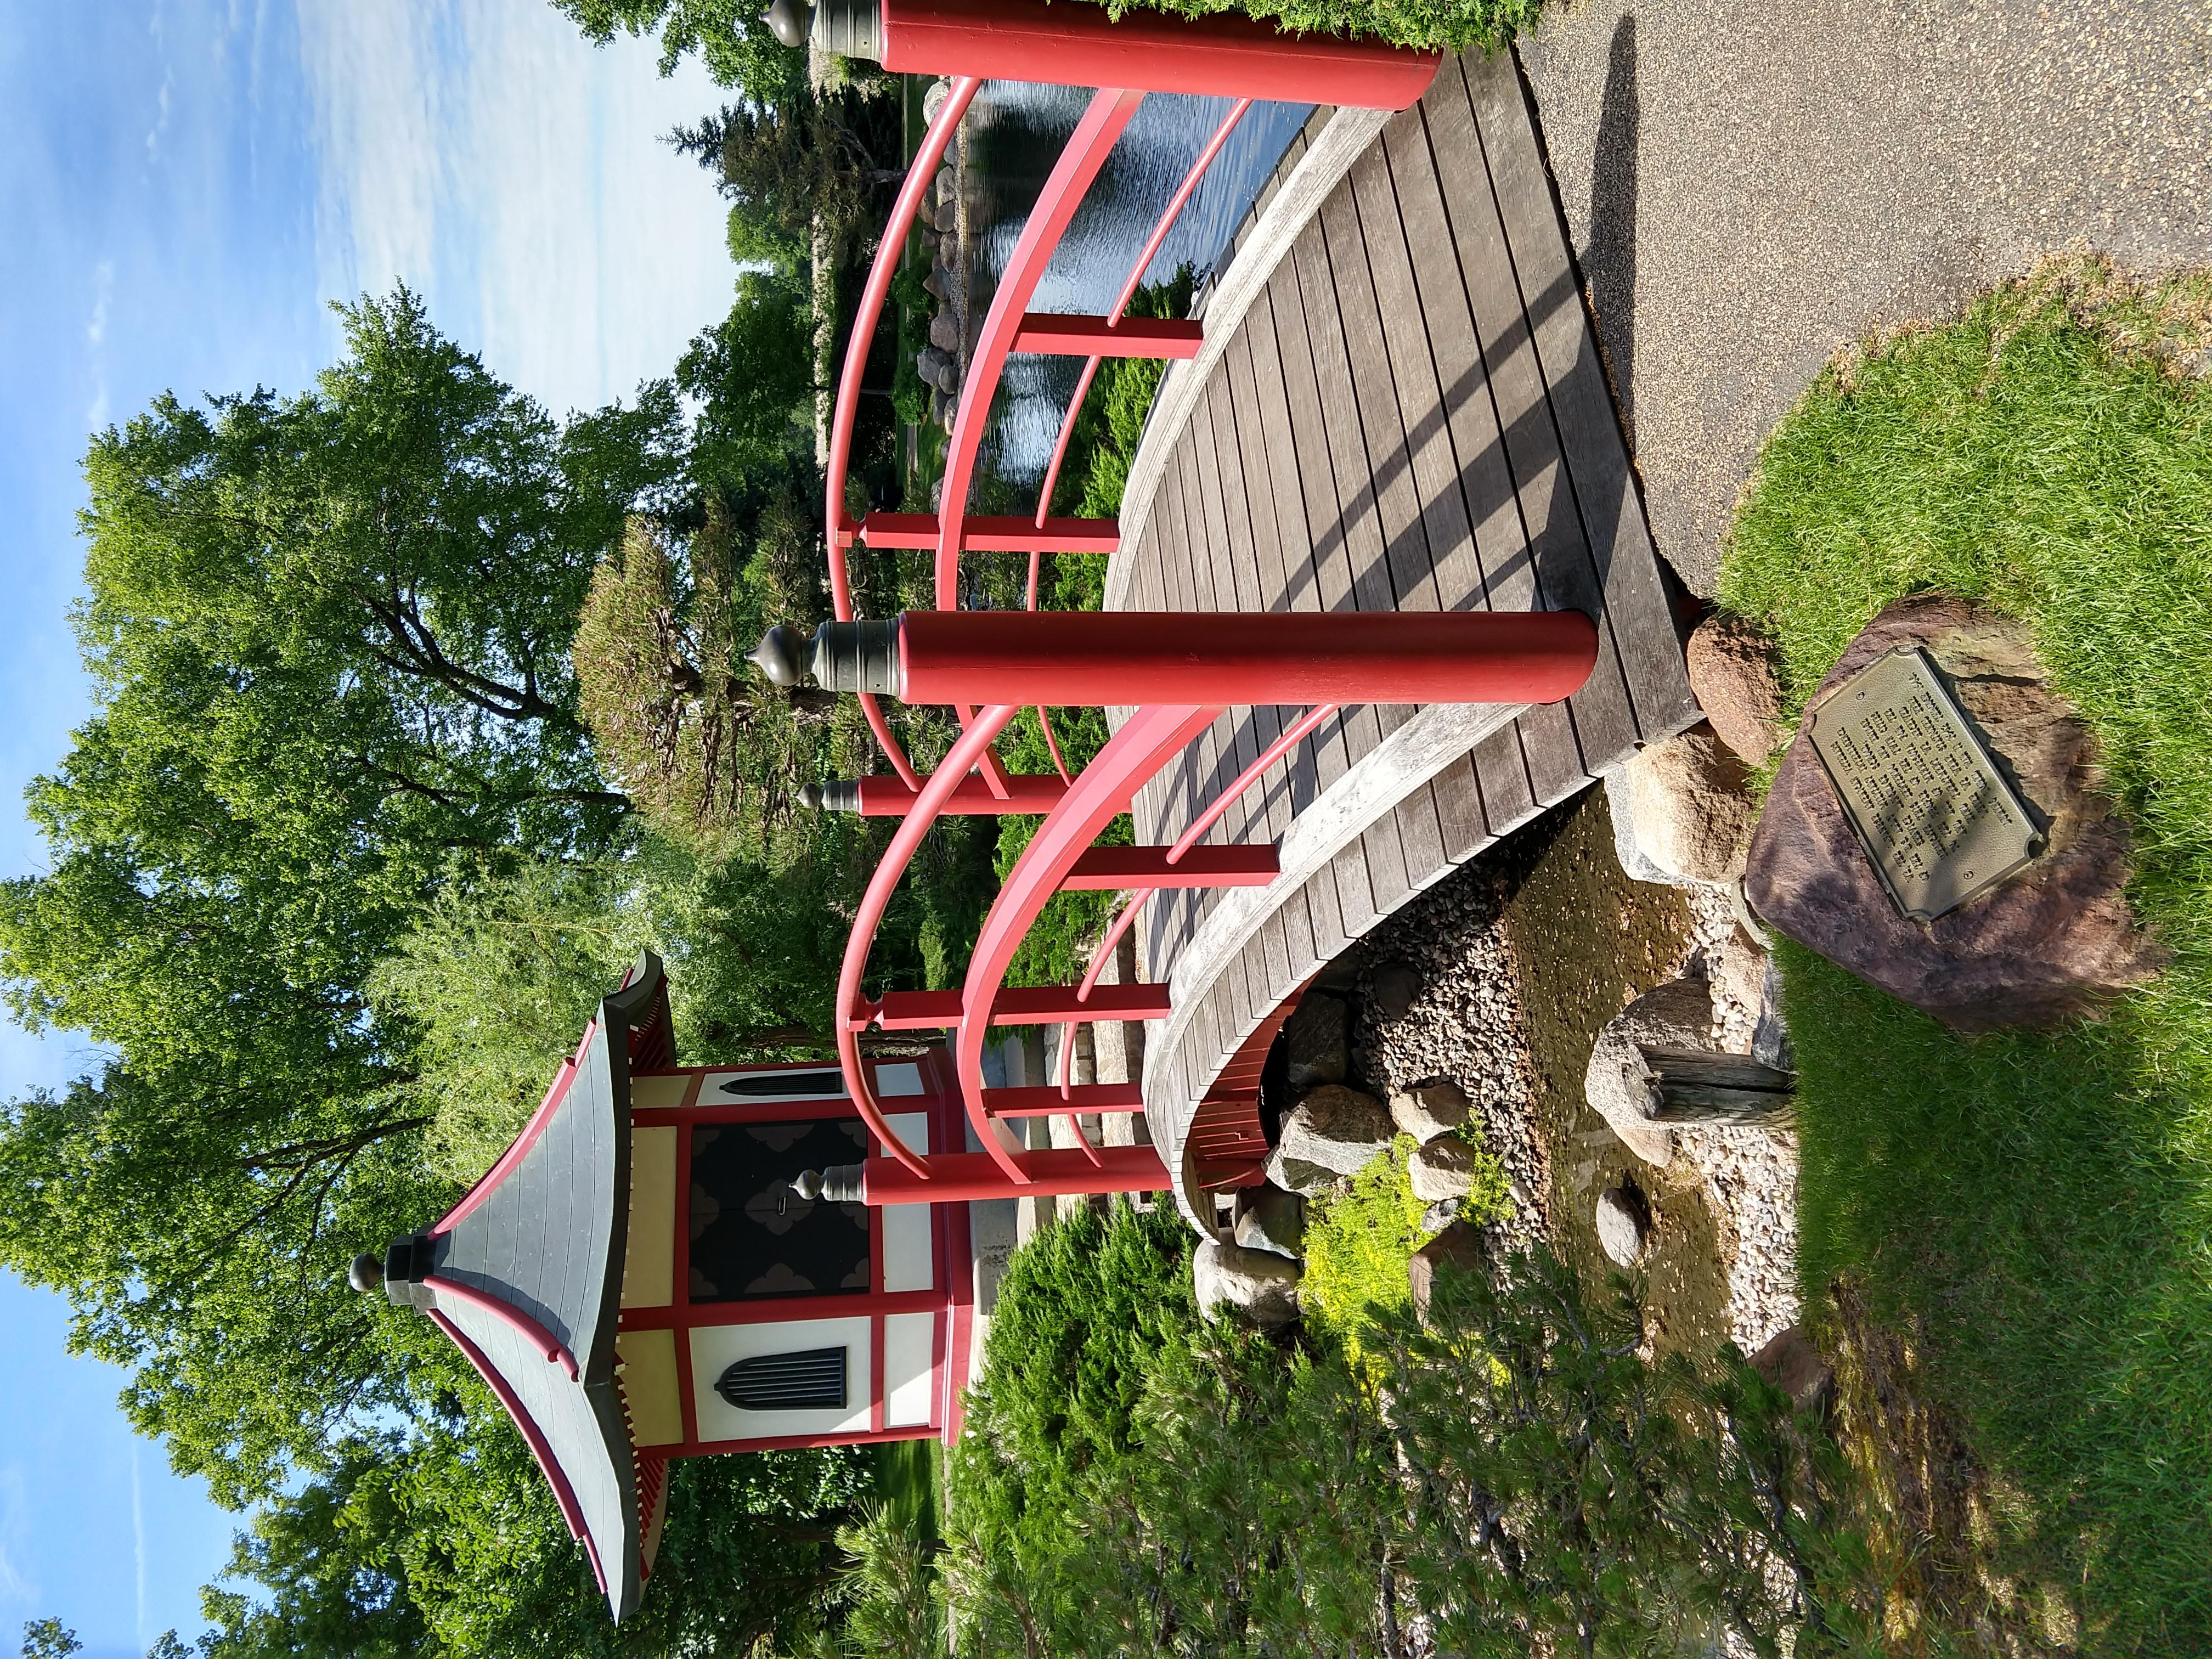 File:Normandale Community College 14 - Japanese garden.jpg